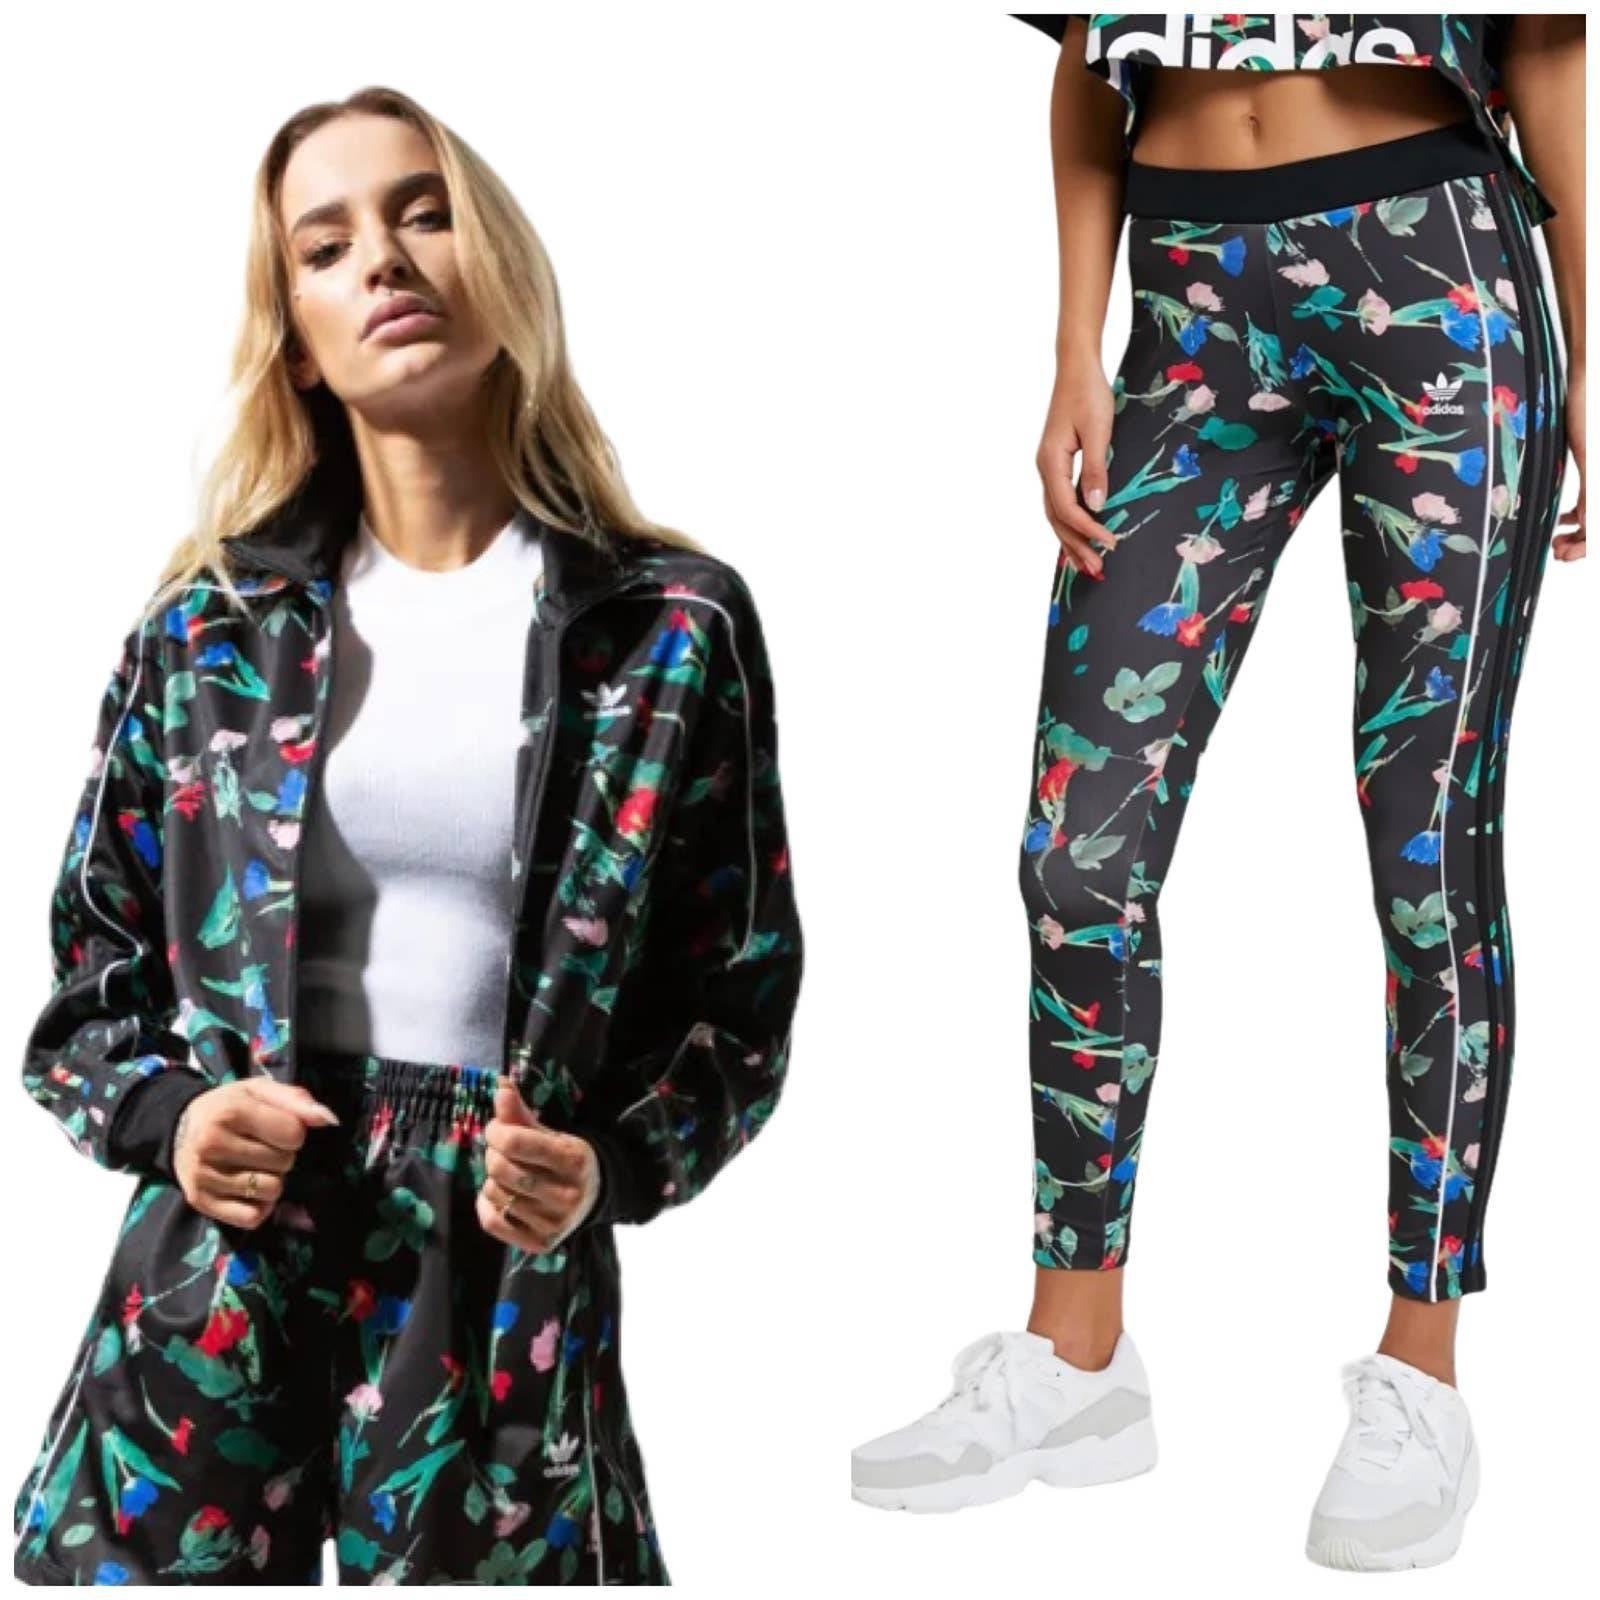 Adidas Floral Active Tracksuits & Sweats   Mercari